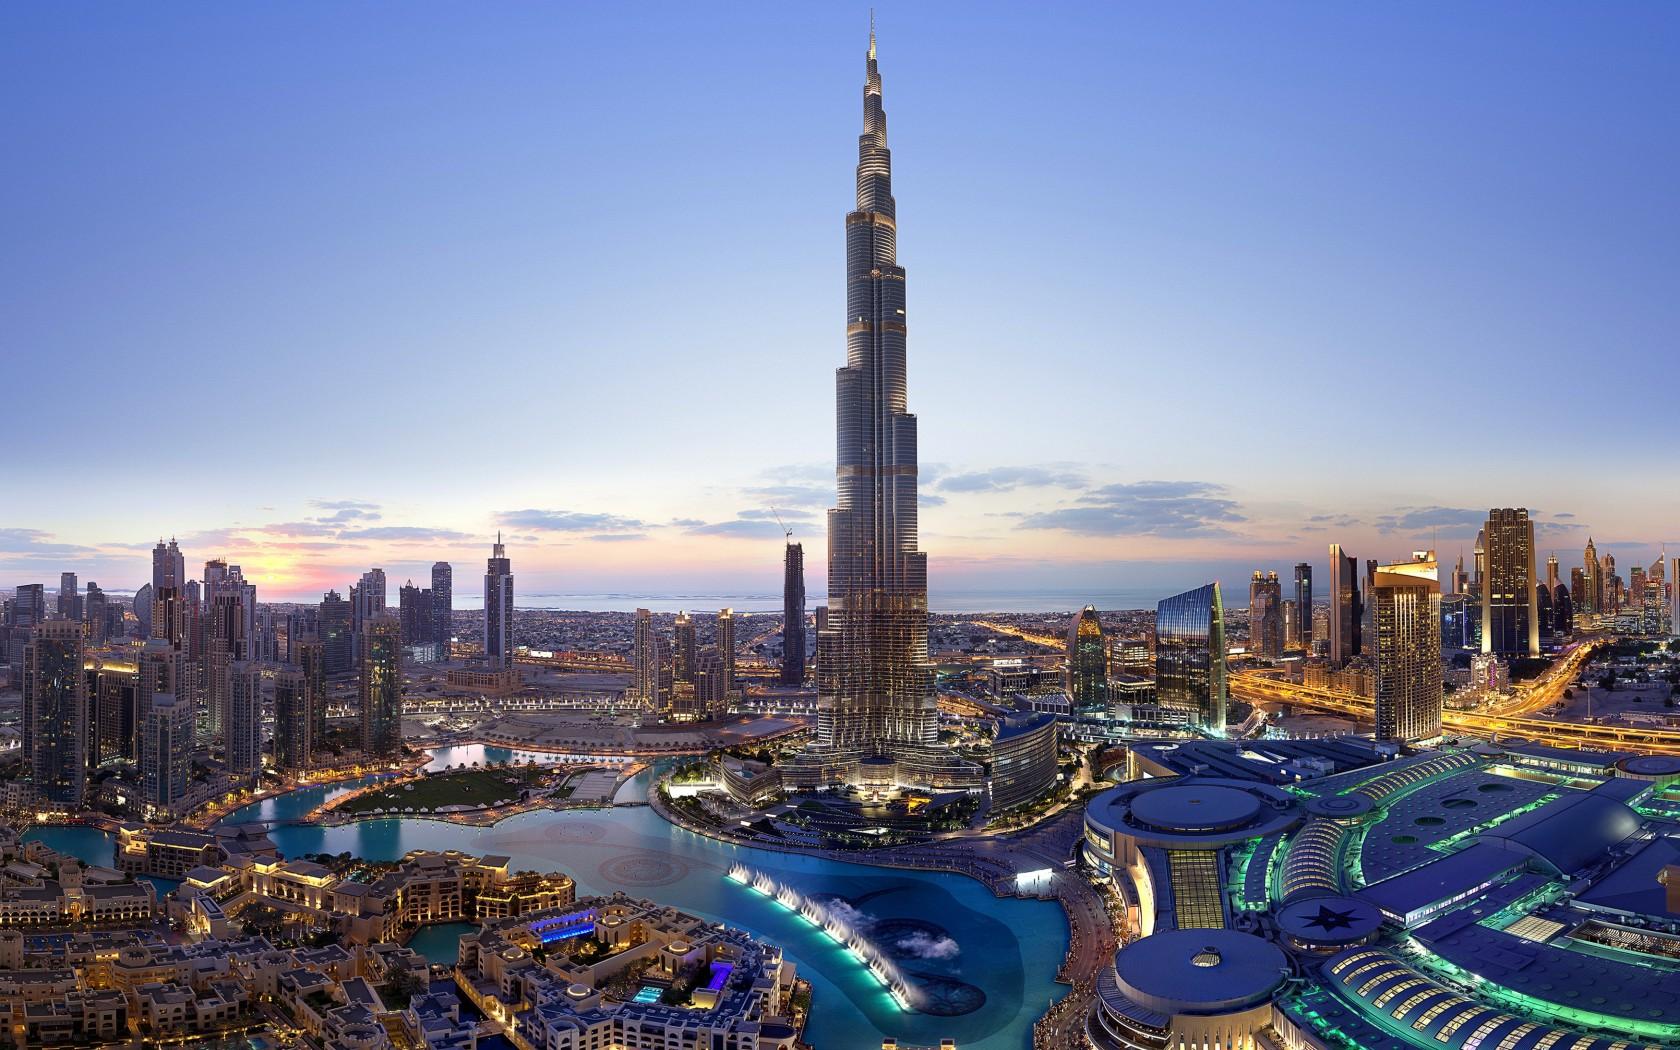 The Tallest of Them All - Burj Khalifa - 2,716 ft.